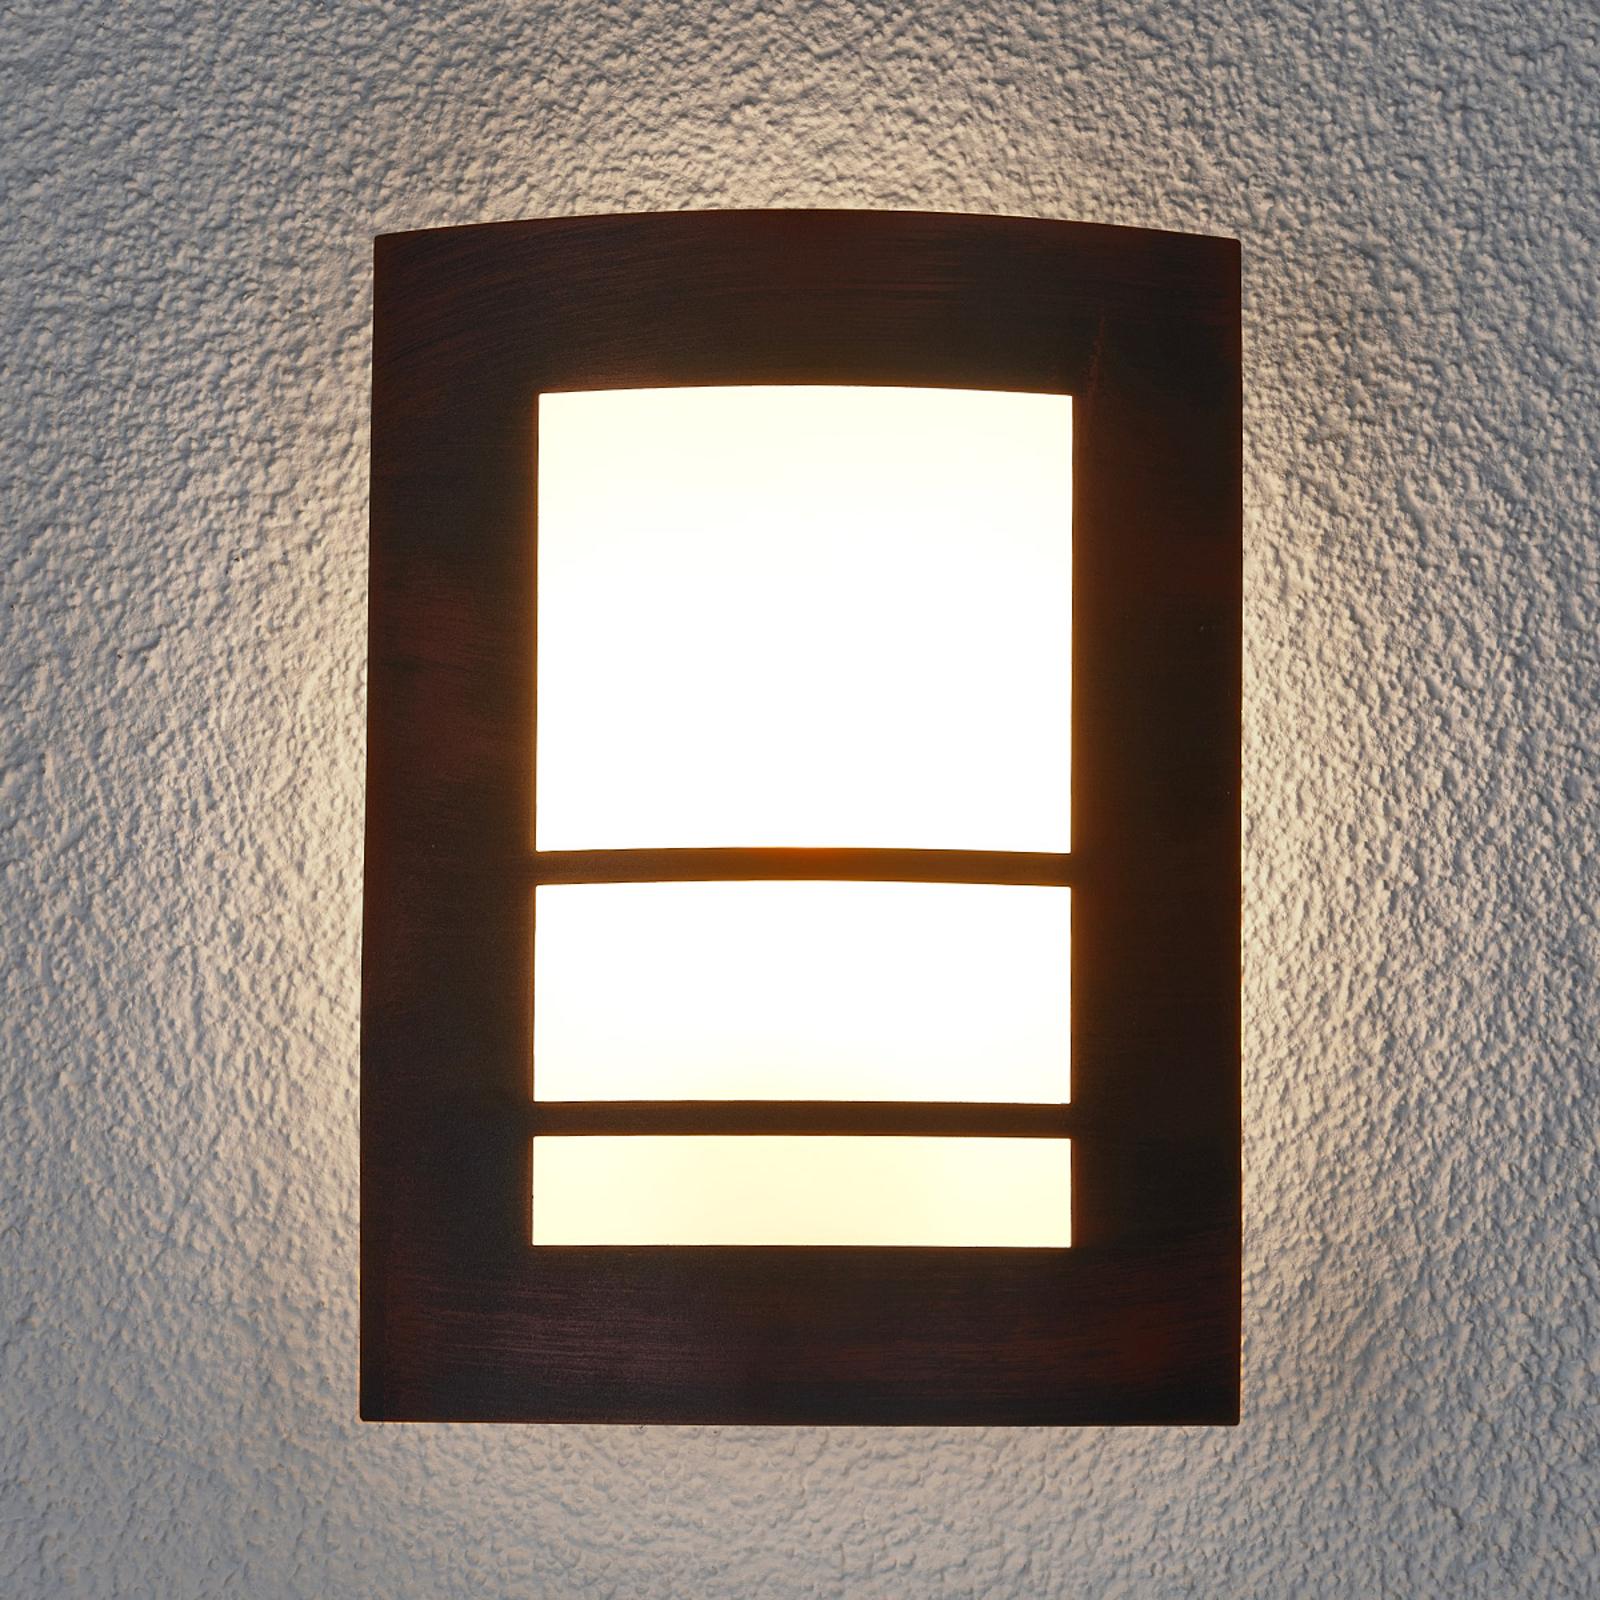 Rustbrun utendørslampe Katalea